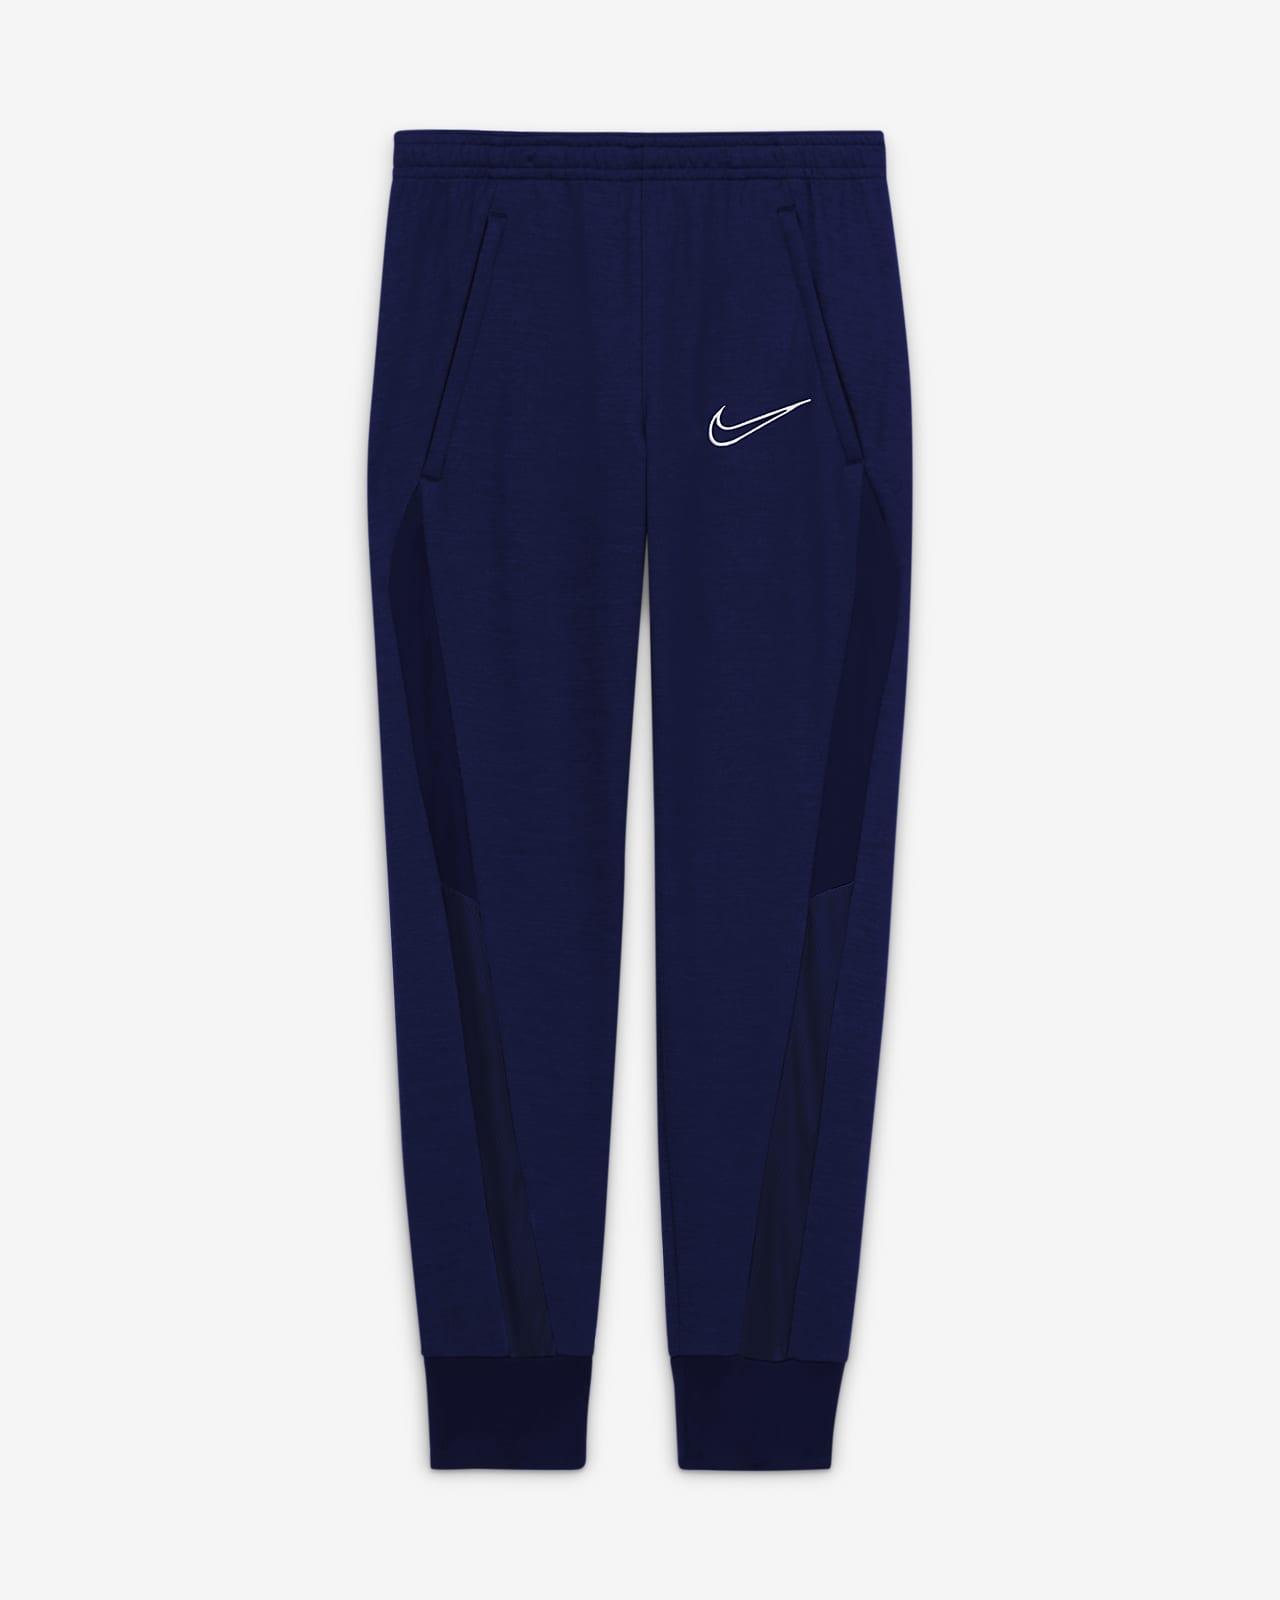 Nike Dri-FIT Academy Older Kids' Knit